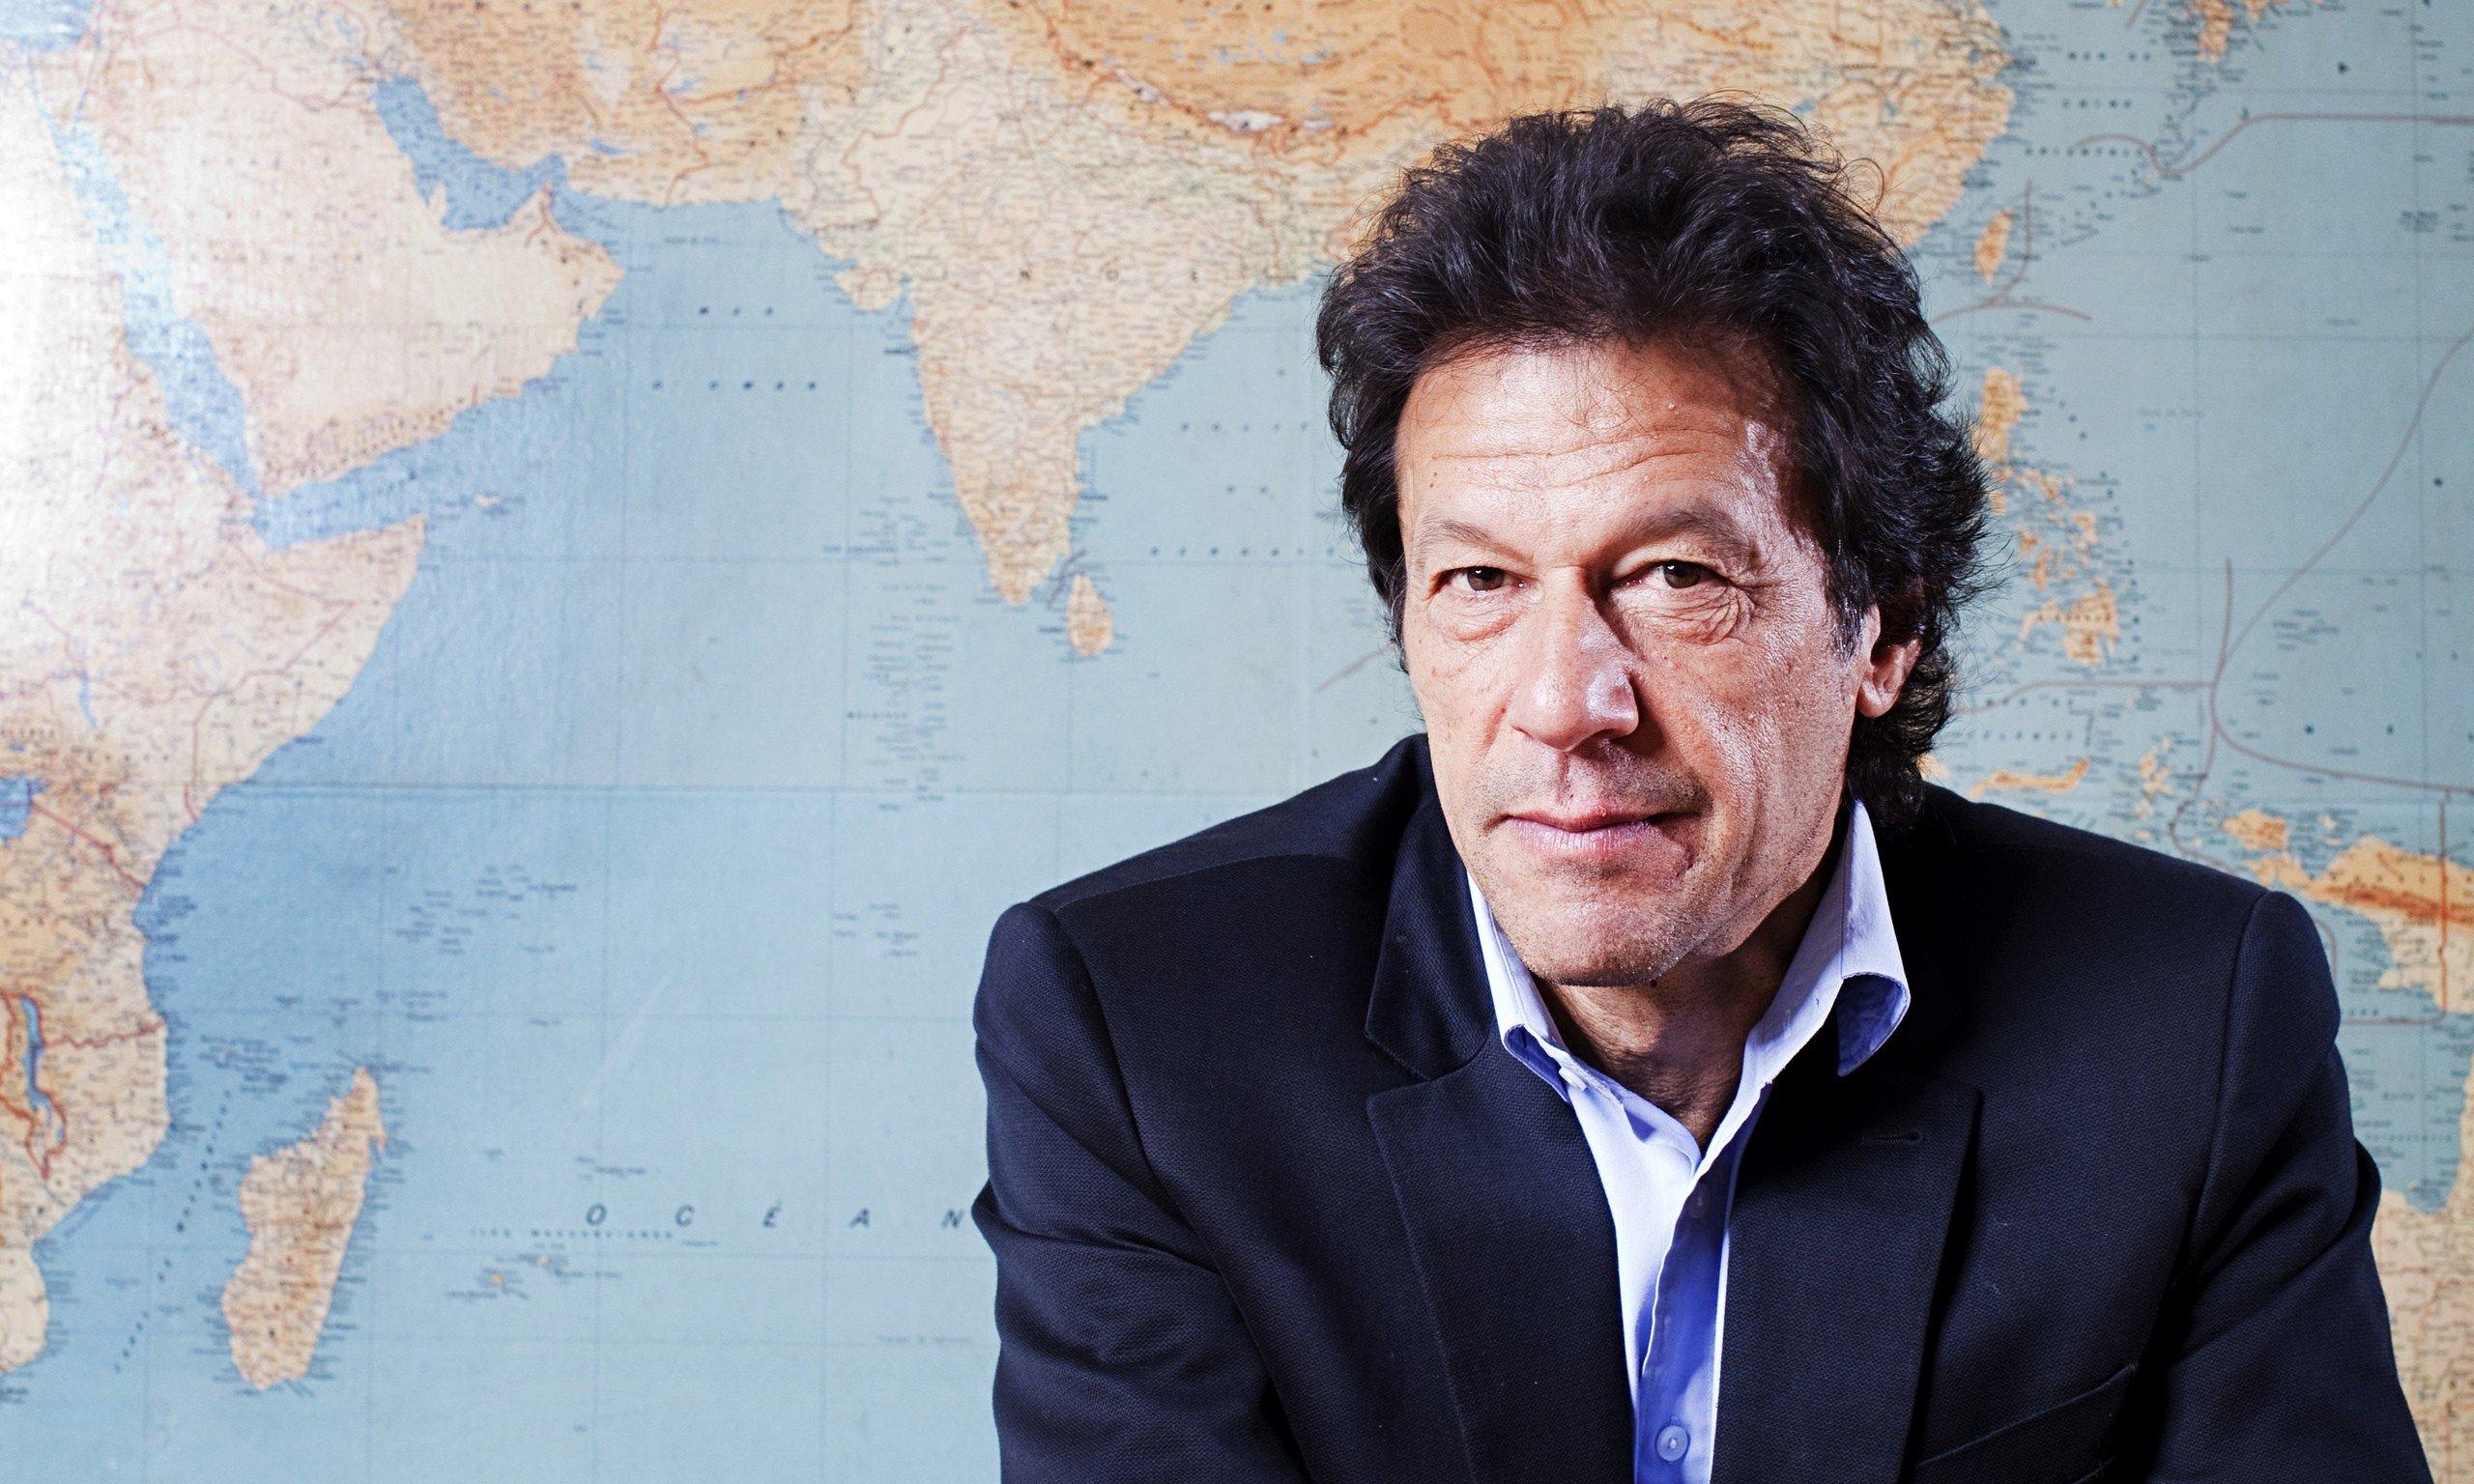 Pakistan cricket imran khan hd wallpapers desktop and mobile images photos - Pakistan cricket wallpapers hd ...